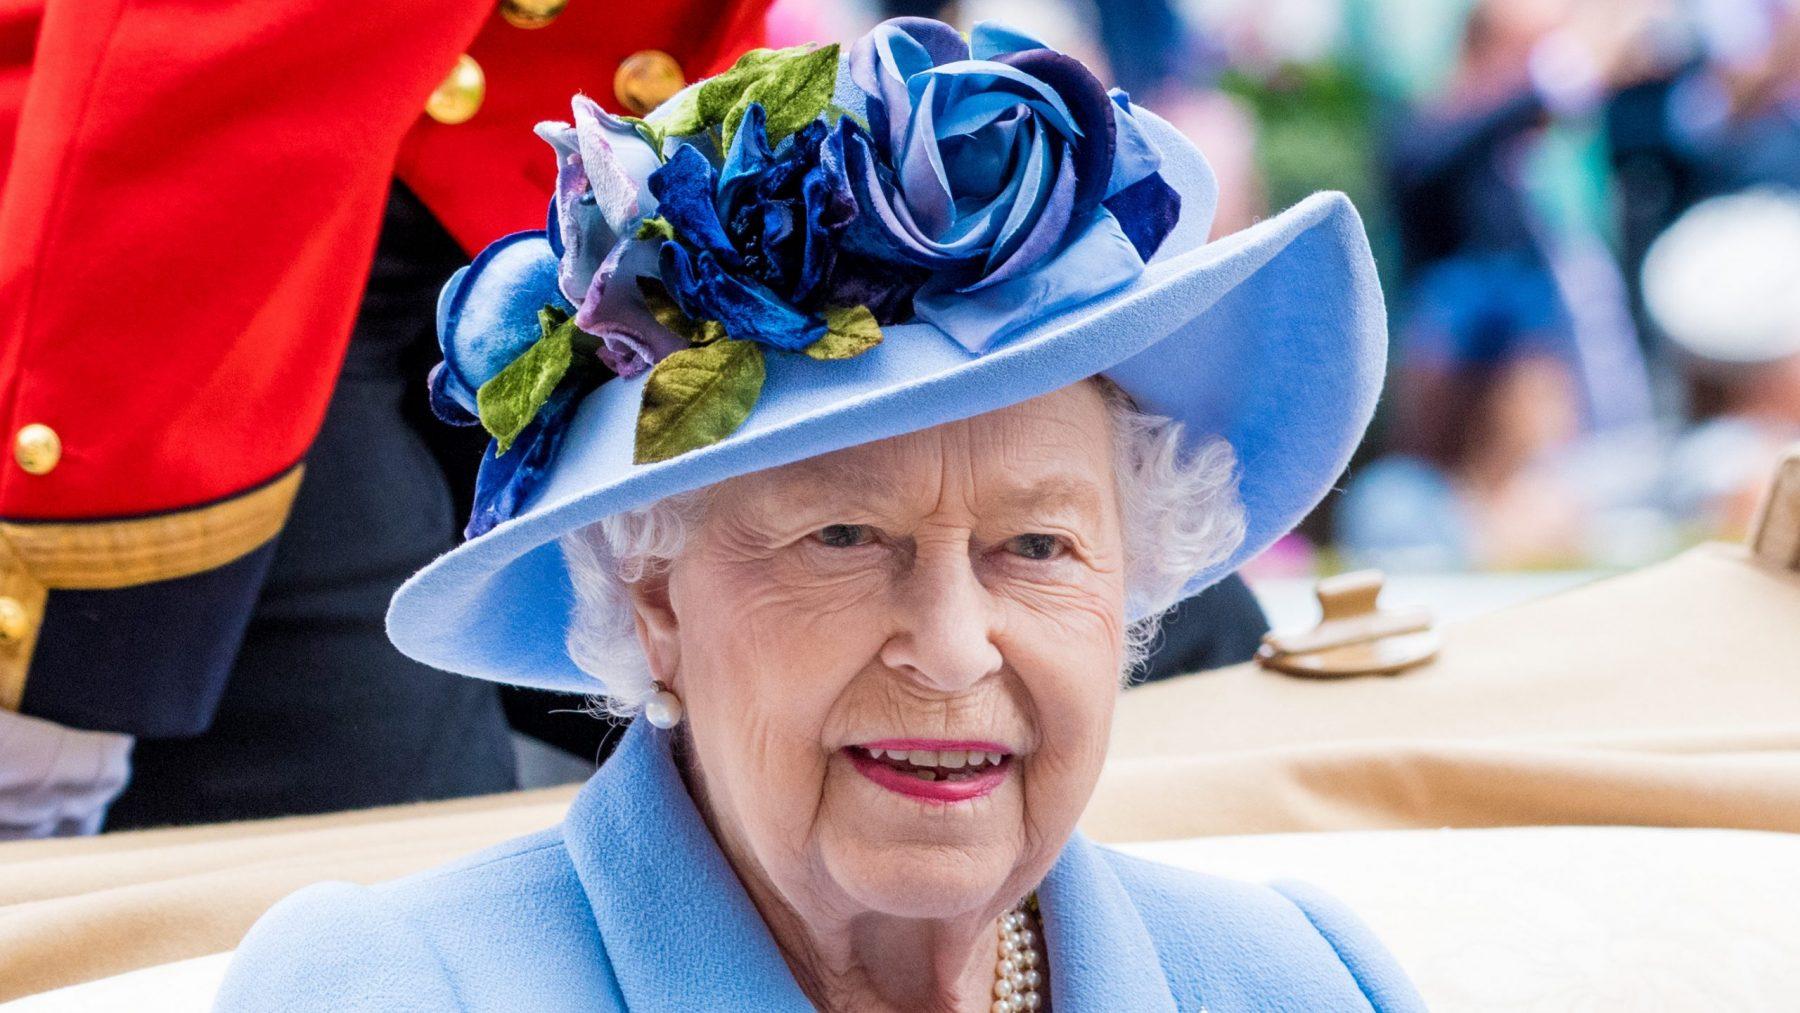 koningin-elizabeth-niet-heel-blij-beslissing-meghan-harry